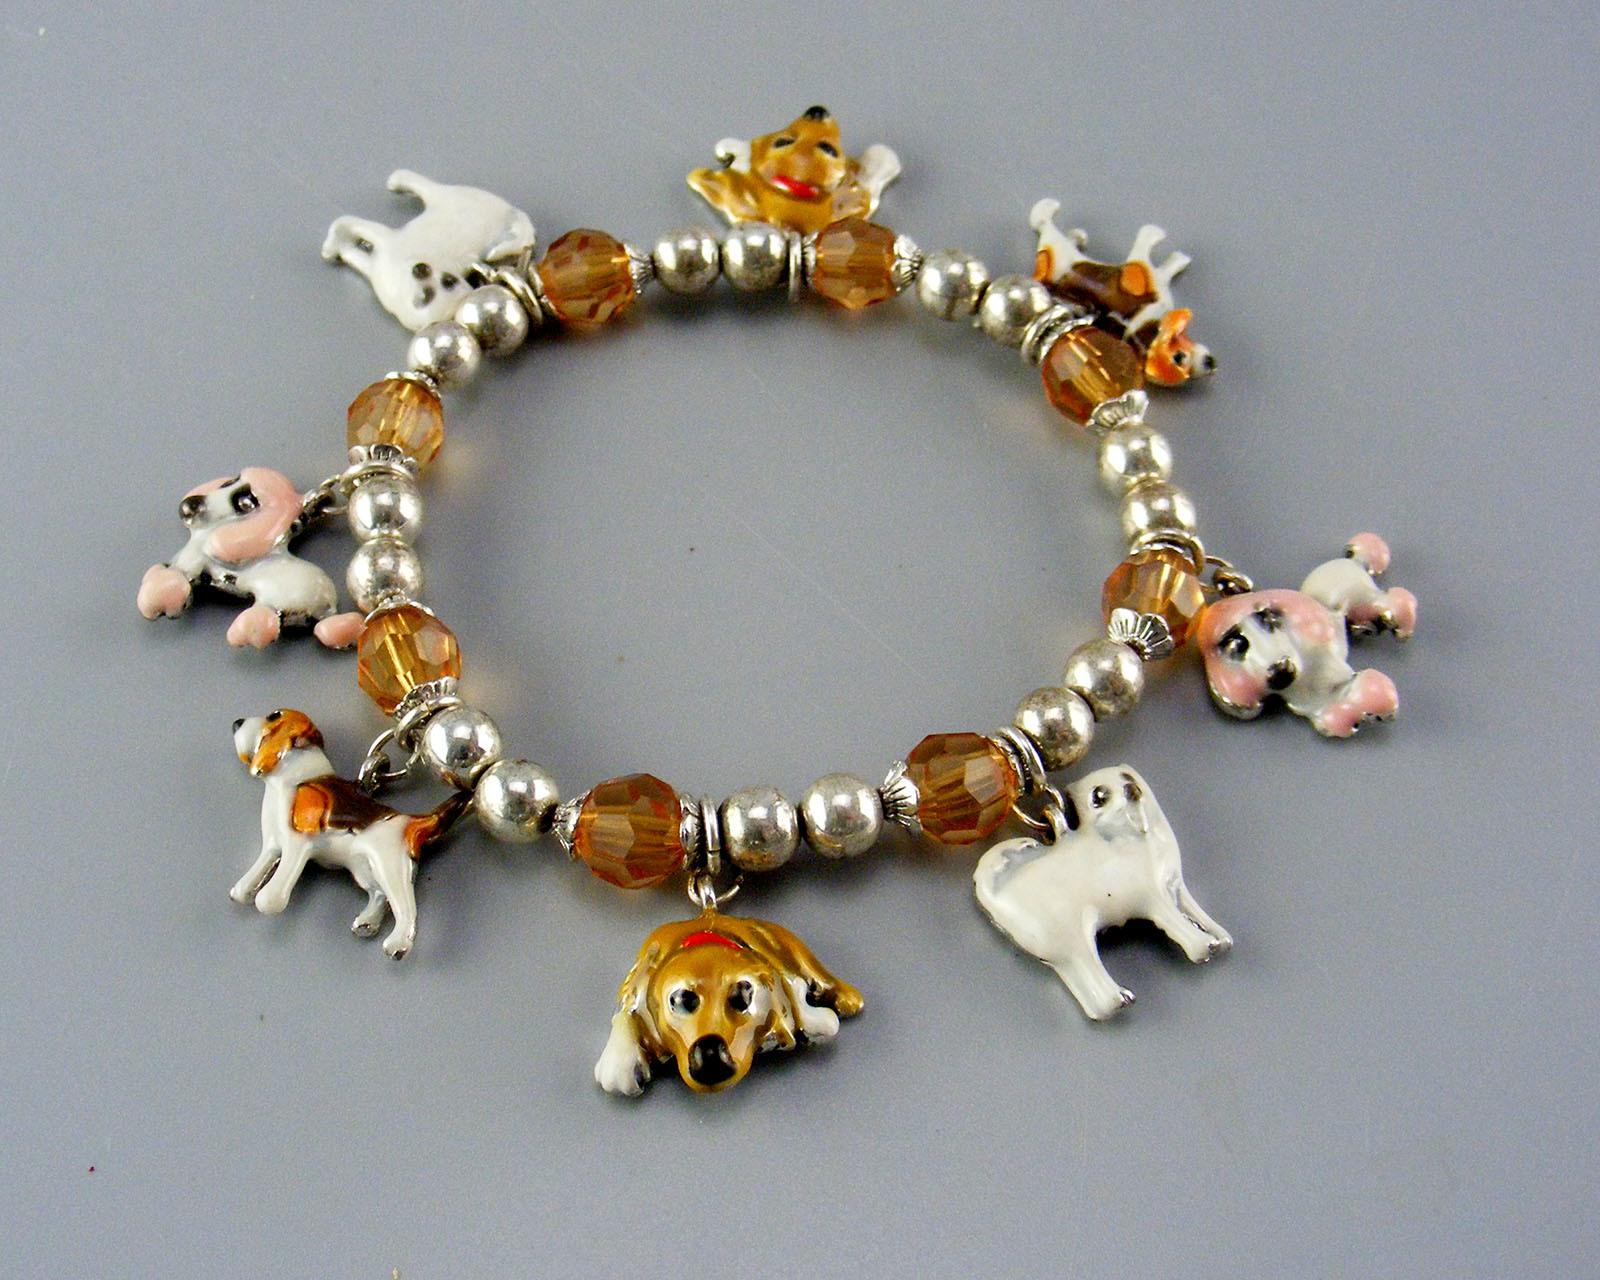 Two Stretch Type Dog Bracelets 00038